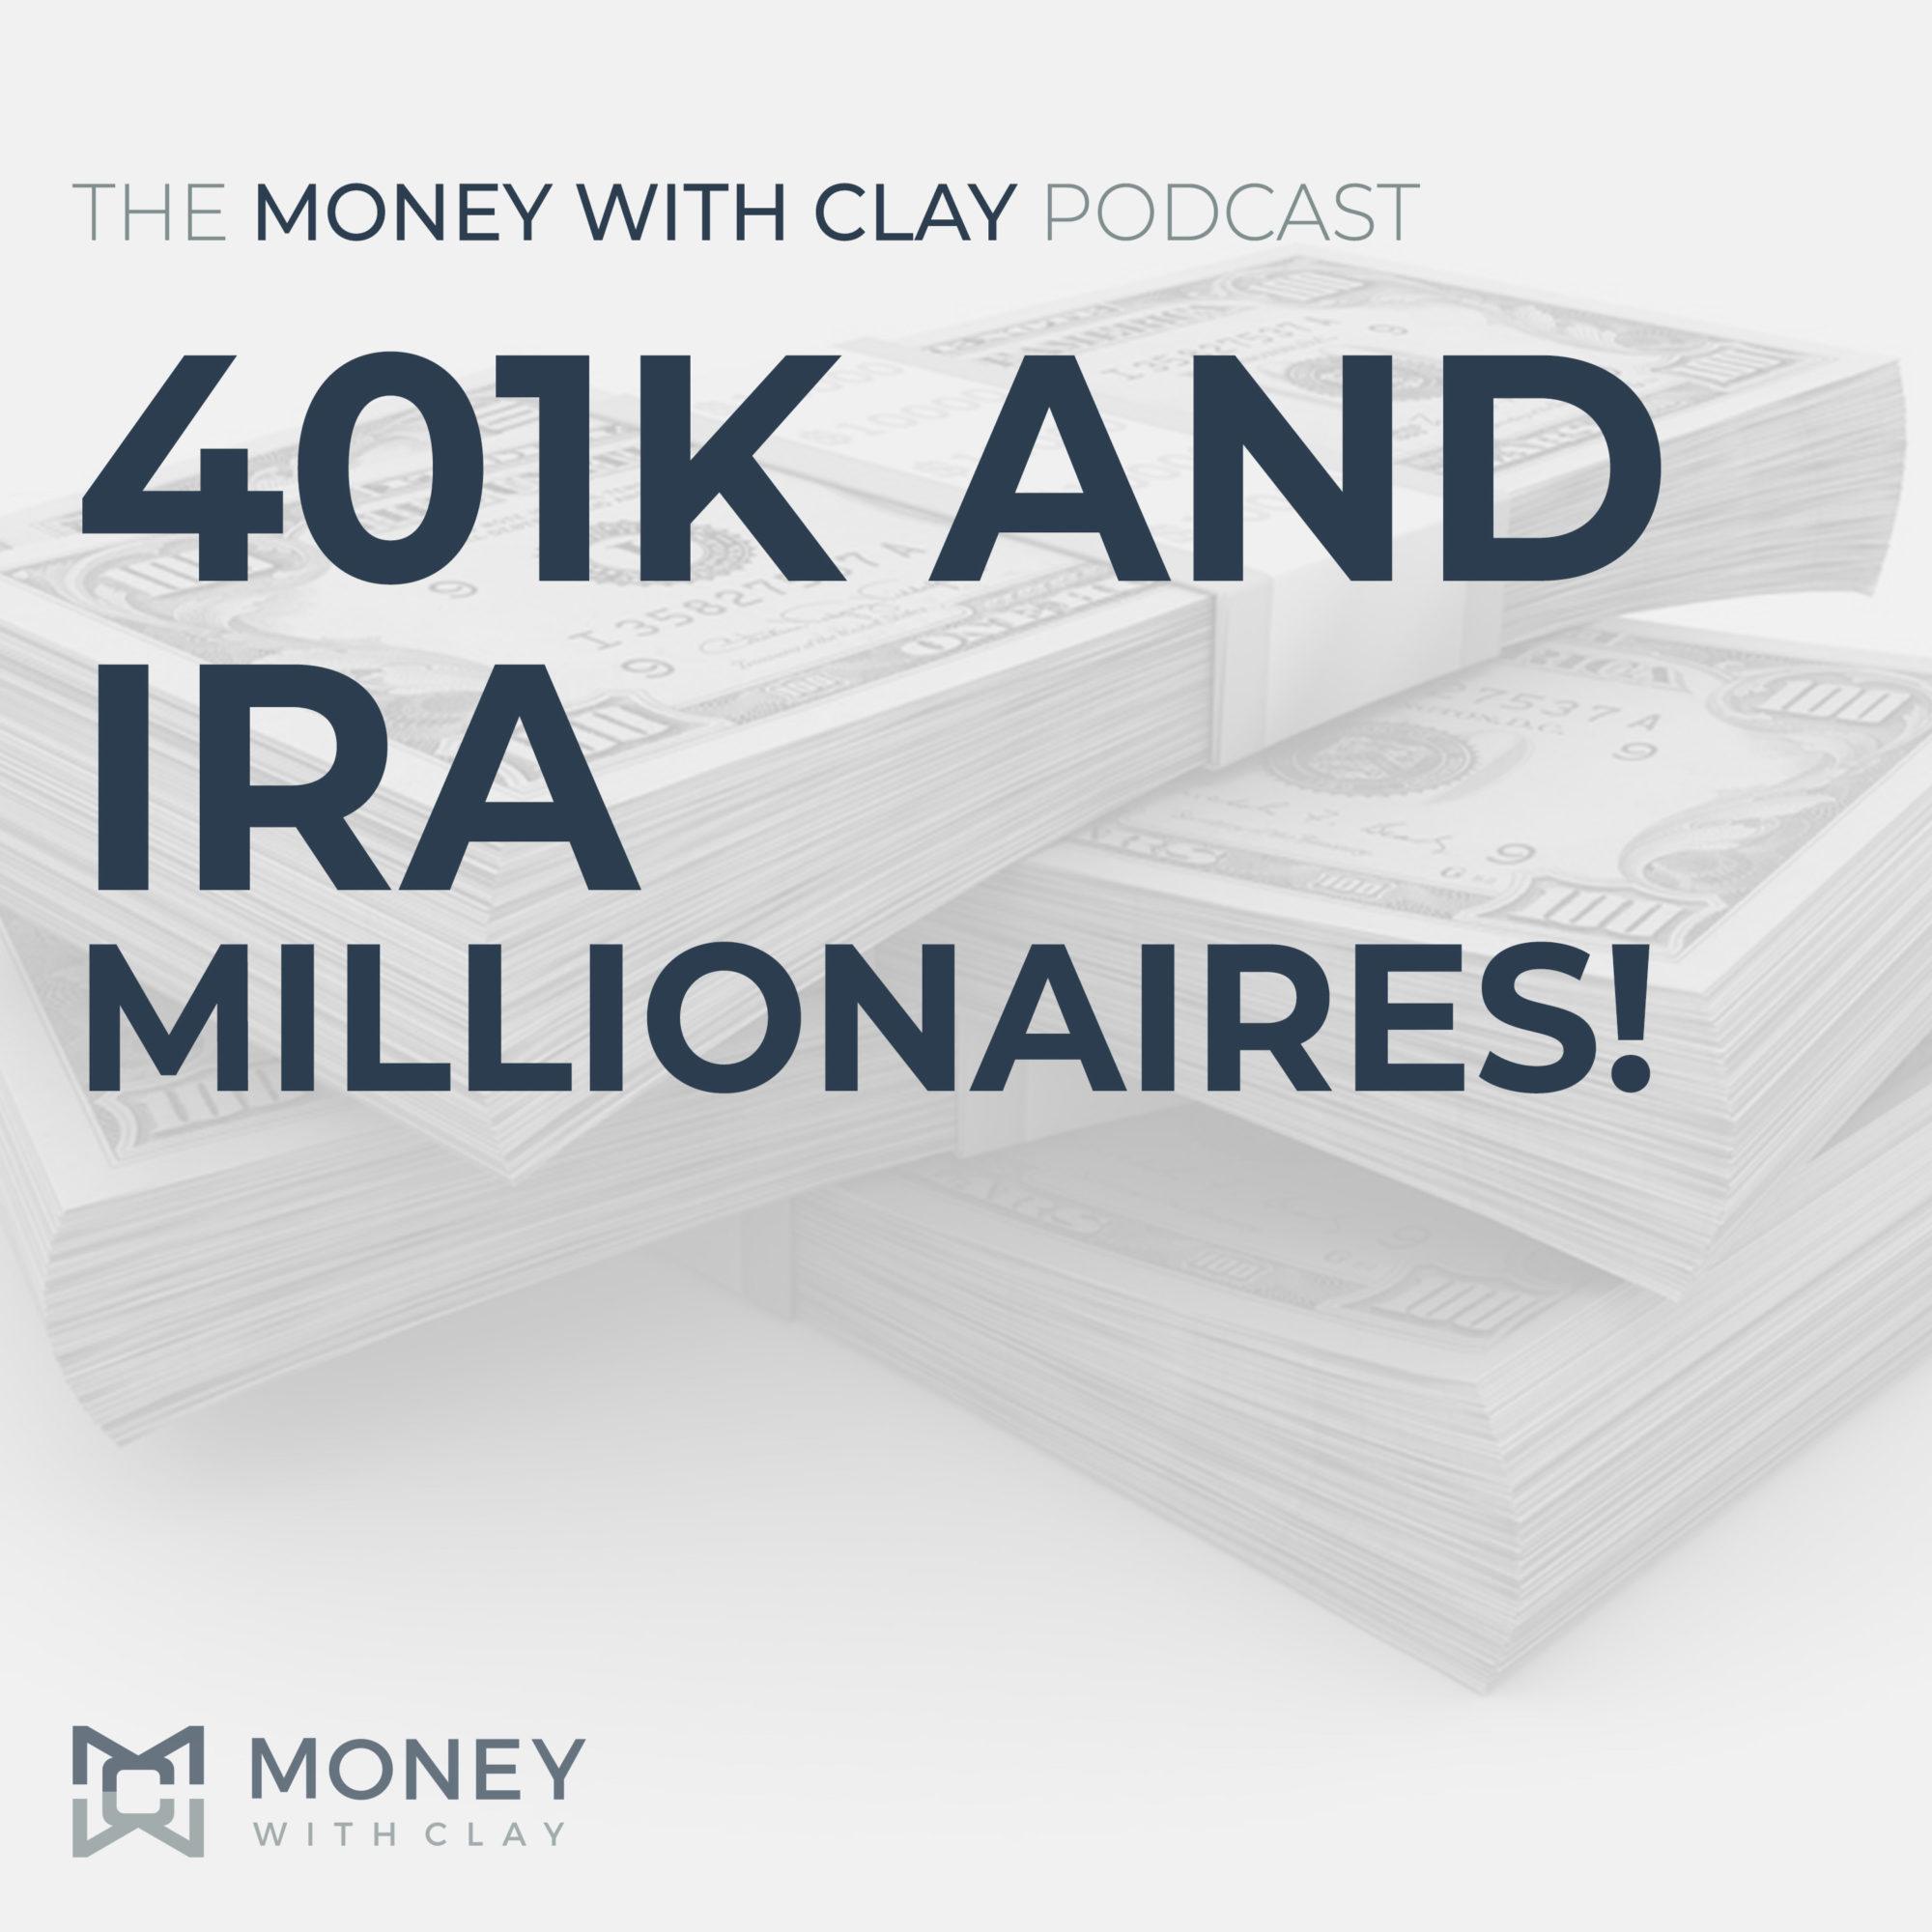 #091 - 401k and IRA Millionaires!